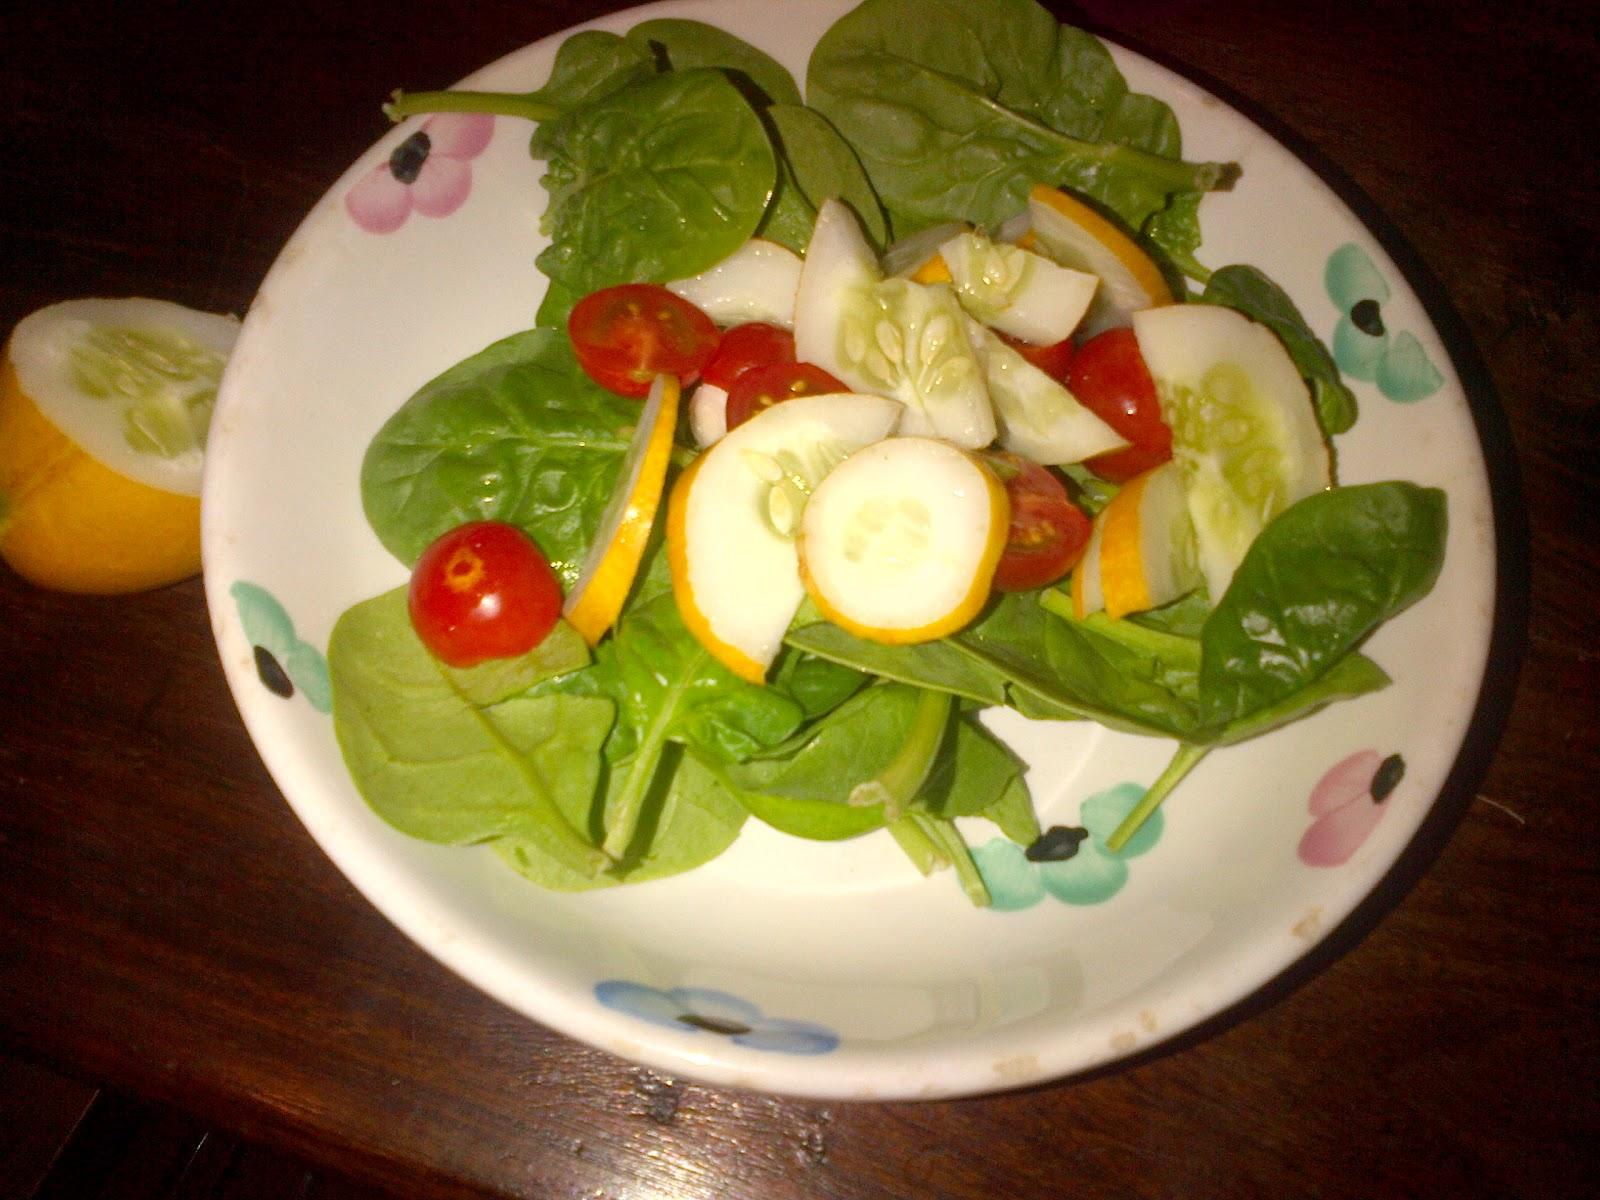 vegan greenling: Local Box 5/31/12 - Indian Cucumber!